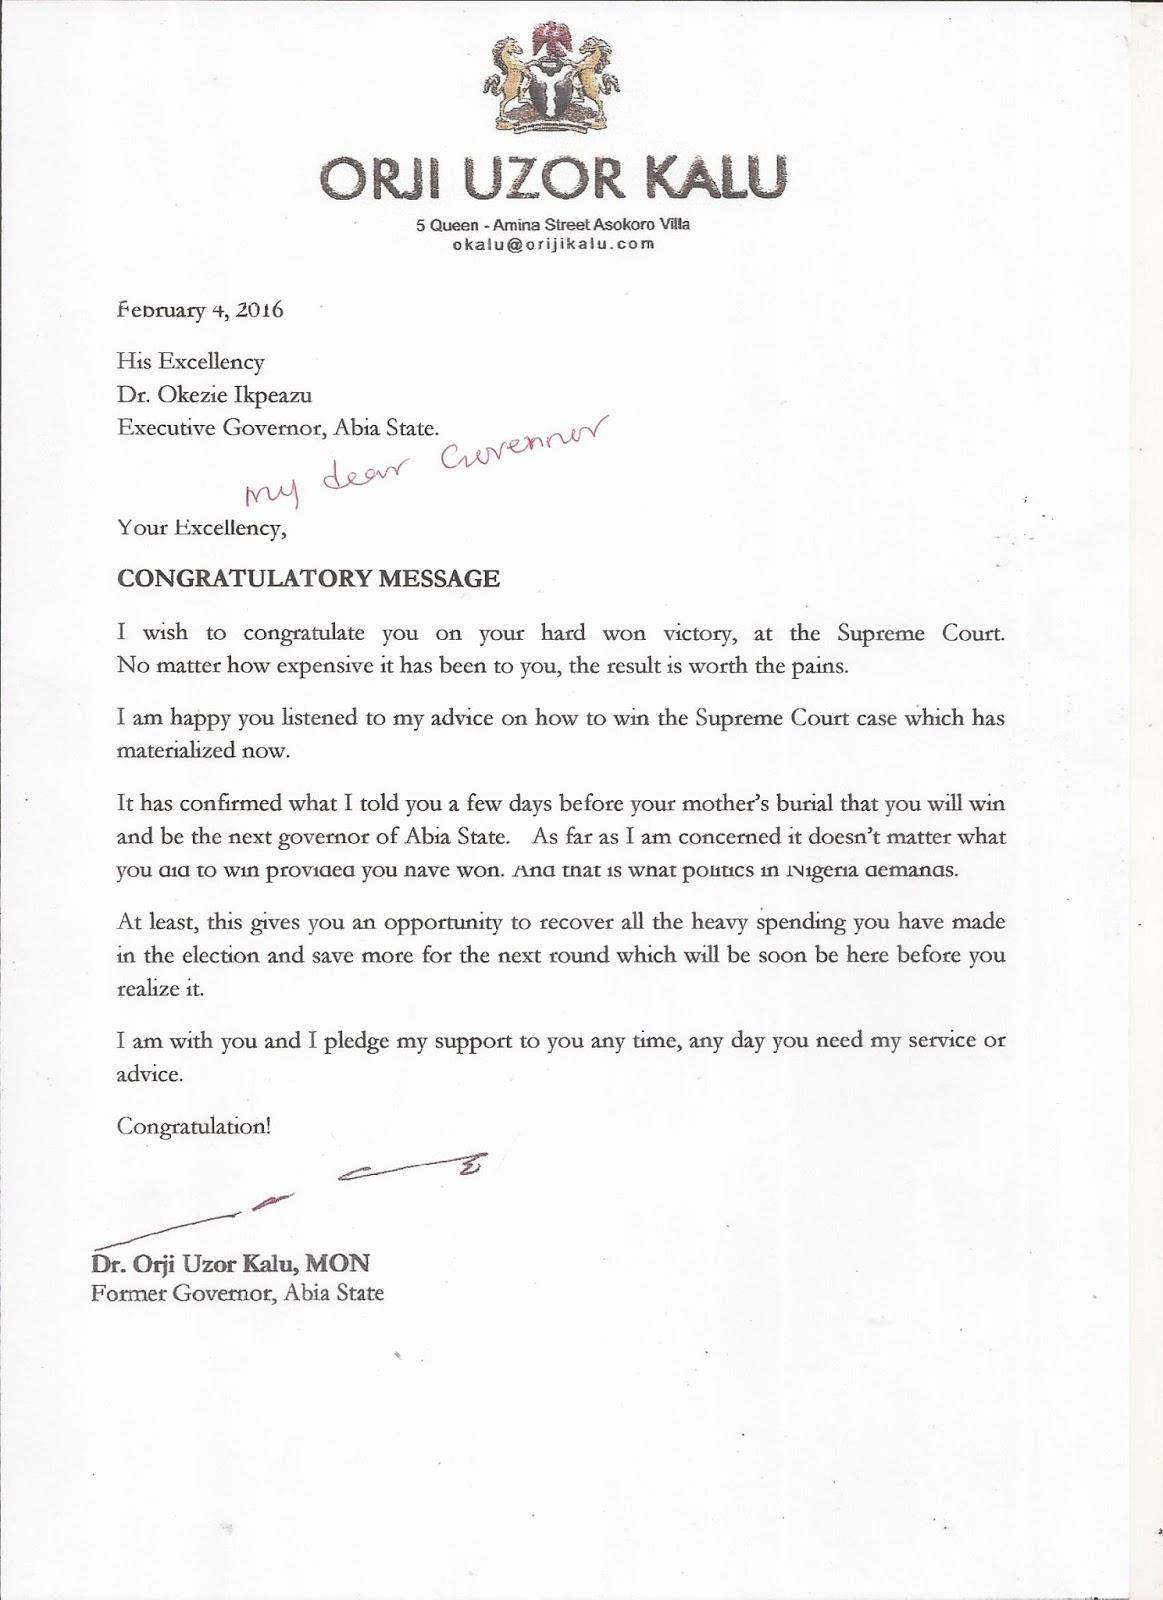 Stella dimoko korkus orji uzor kalus letter to governor orji uzor kalus letter to governor ikpeazu leaks altavistaventures Choice Image